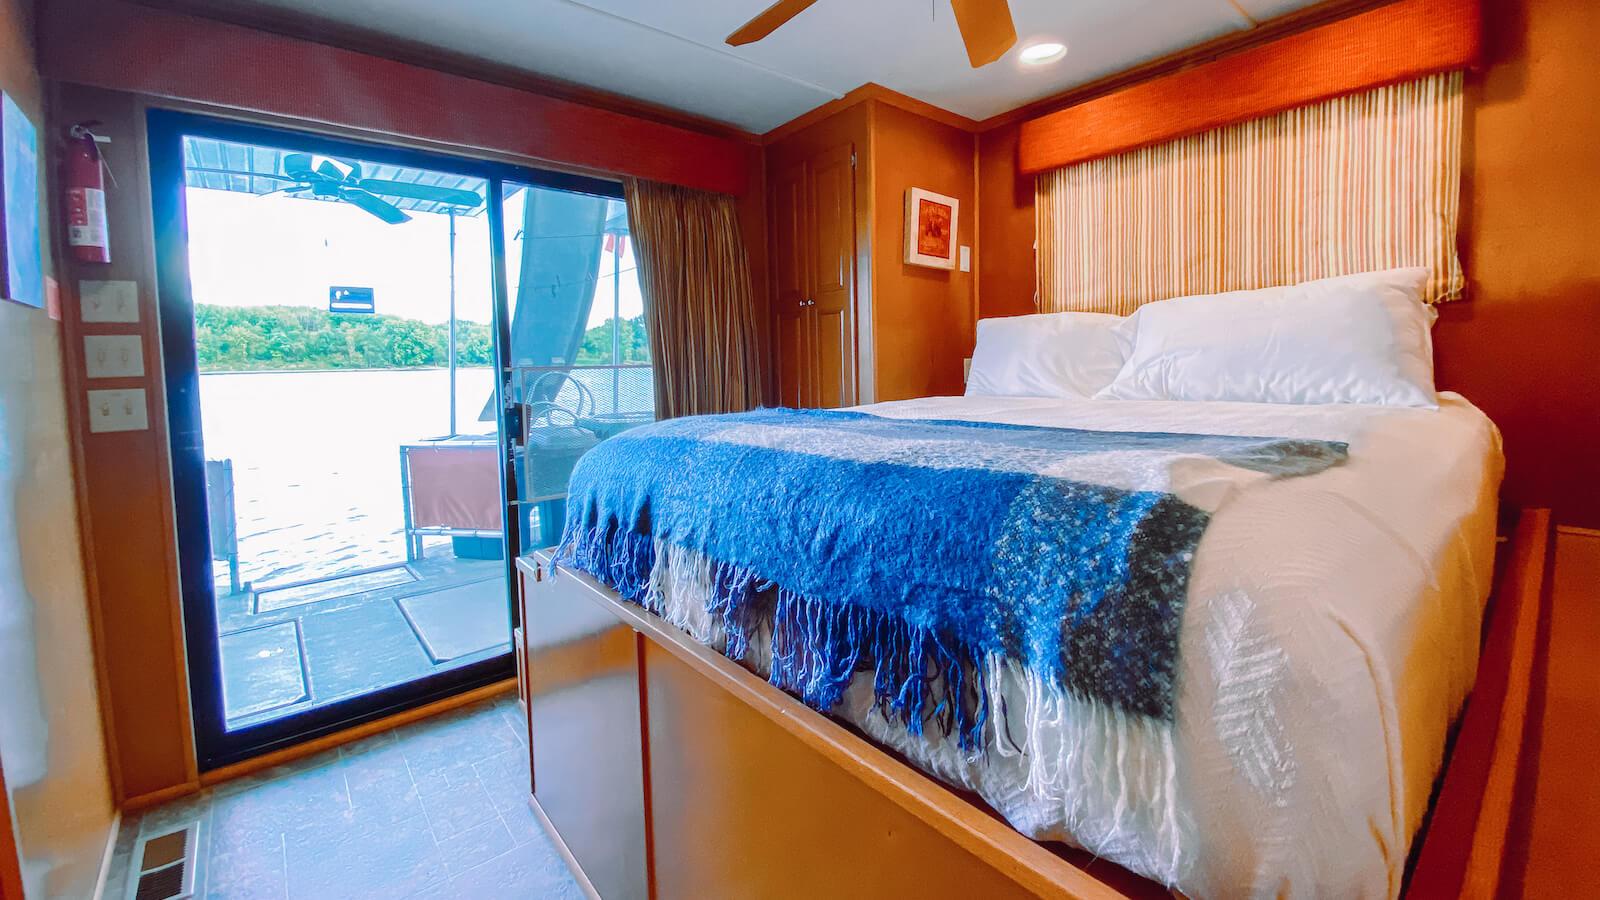 Bedroom in the S&S Rentals Monticello Houseboat